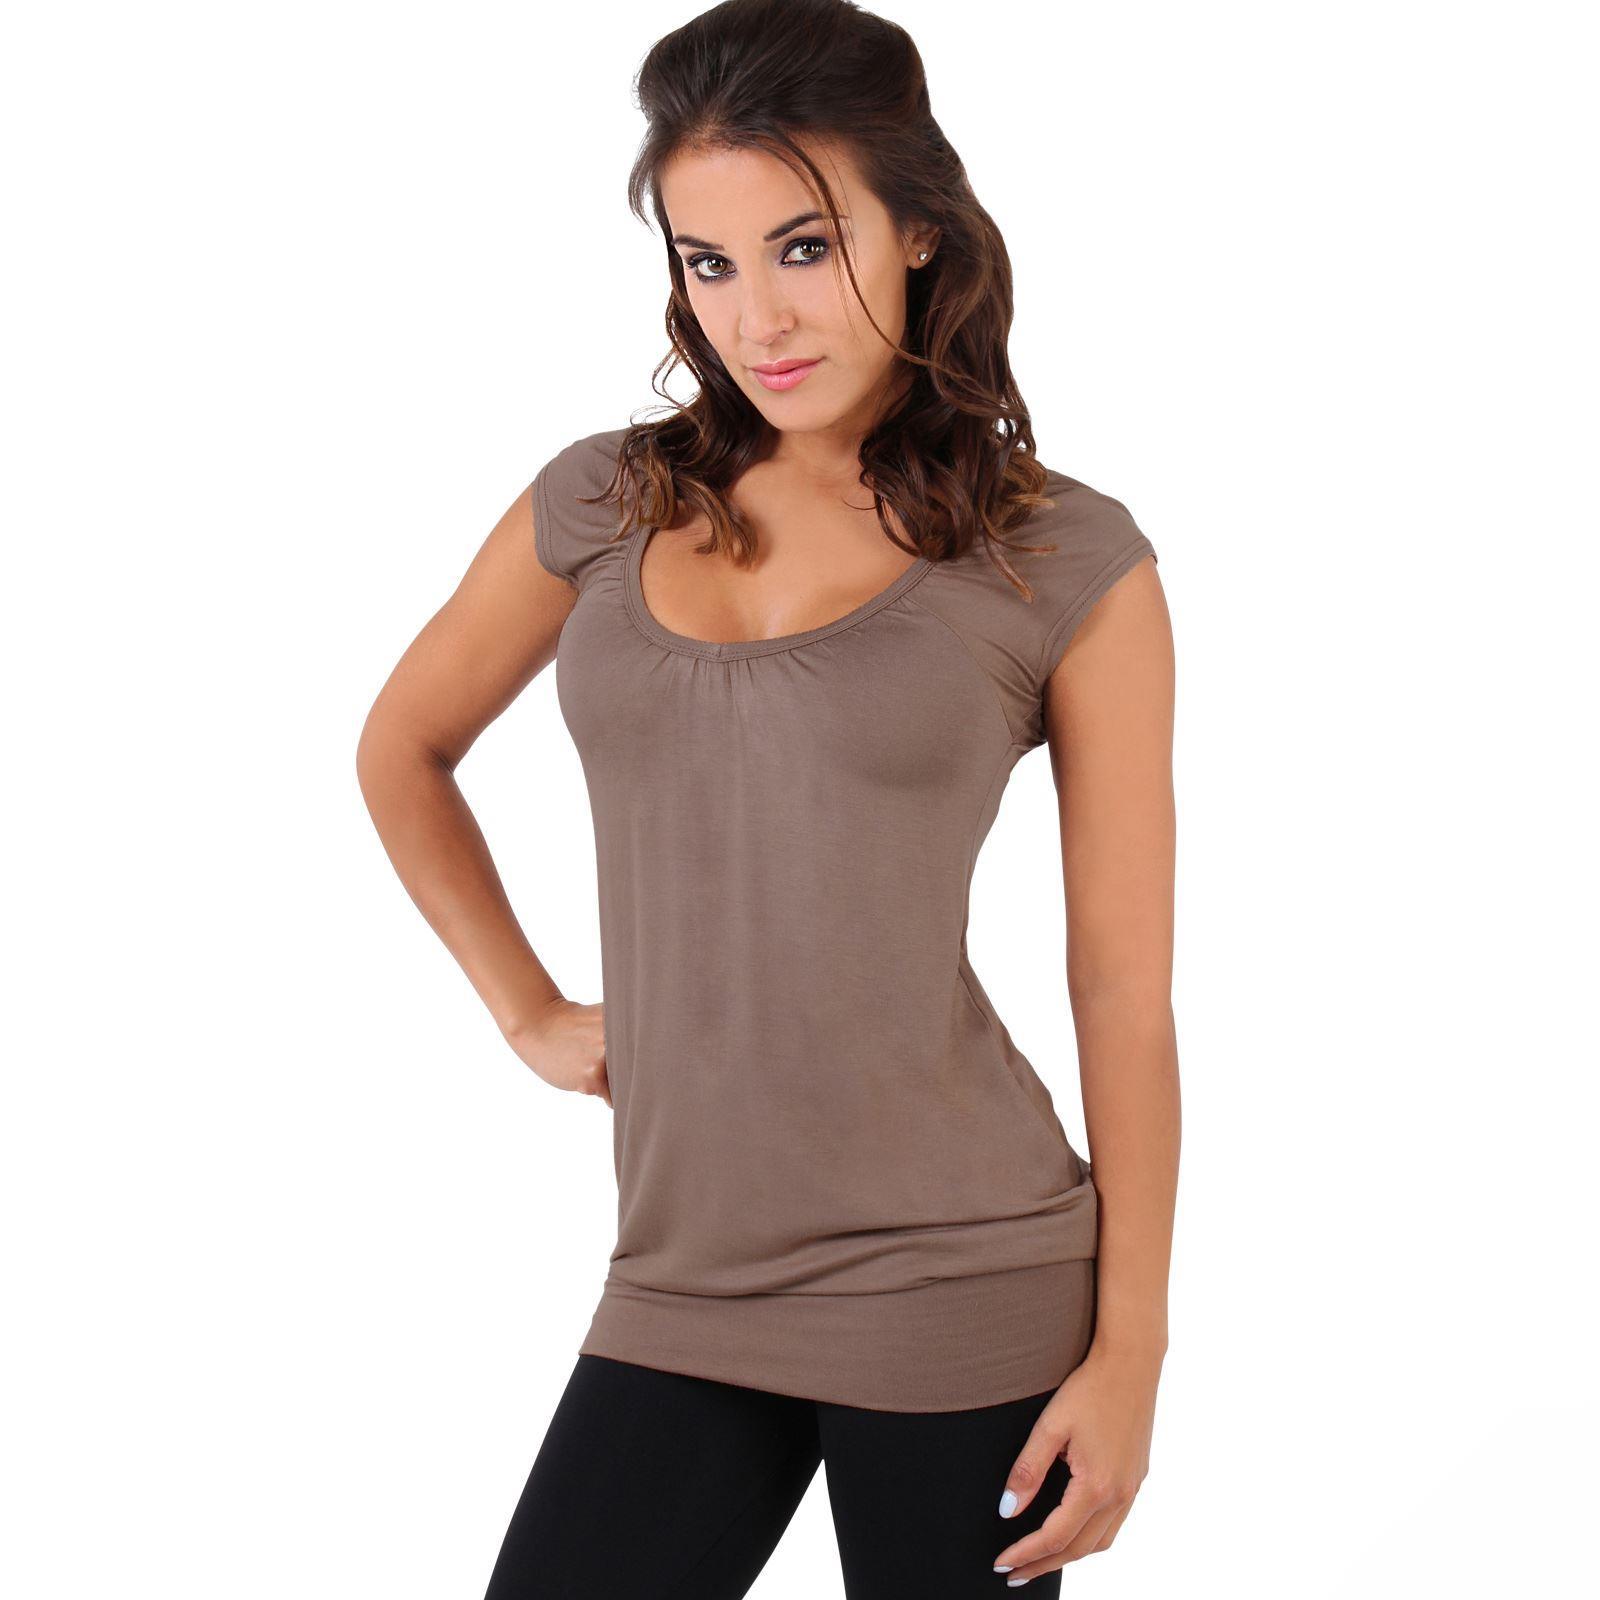 Womens-Ladies-Scoop-Neck-Blouse-V-T-Shirt-Long-Short-Sleeve-Plain-Loose-Top thumbnail 29